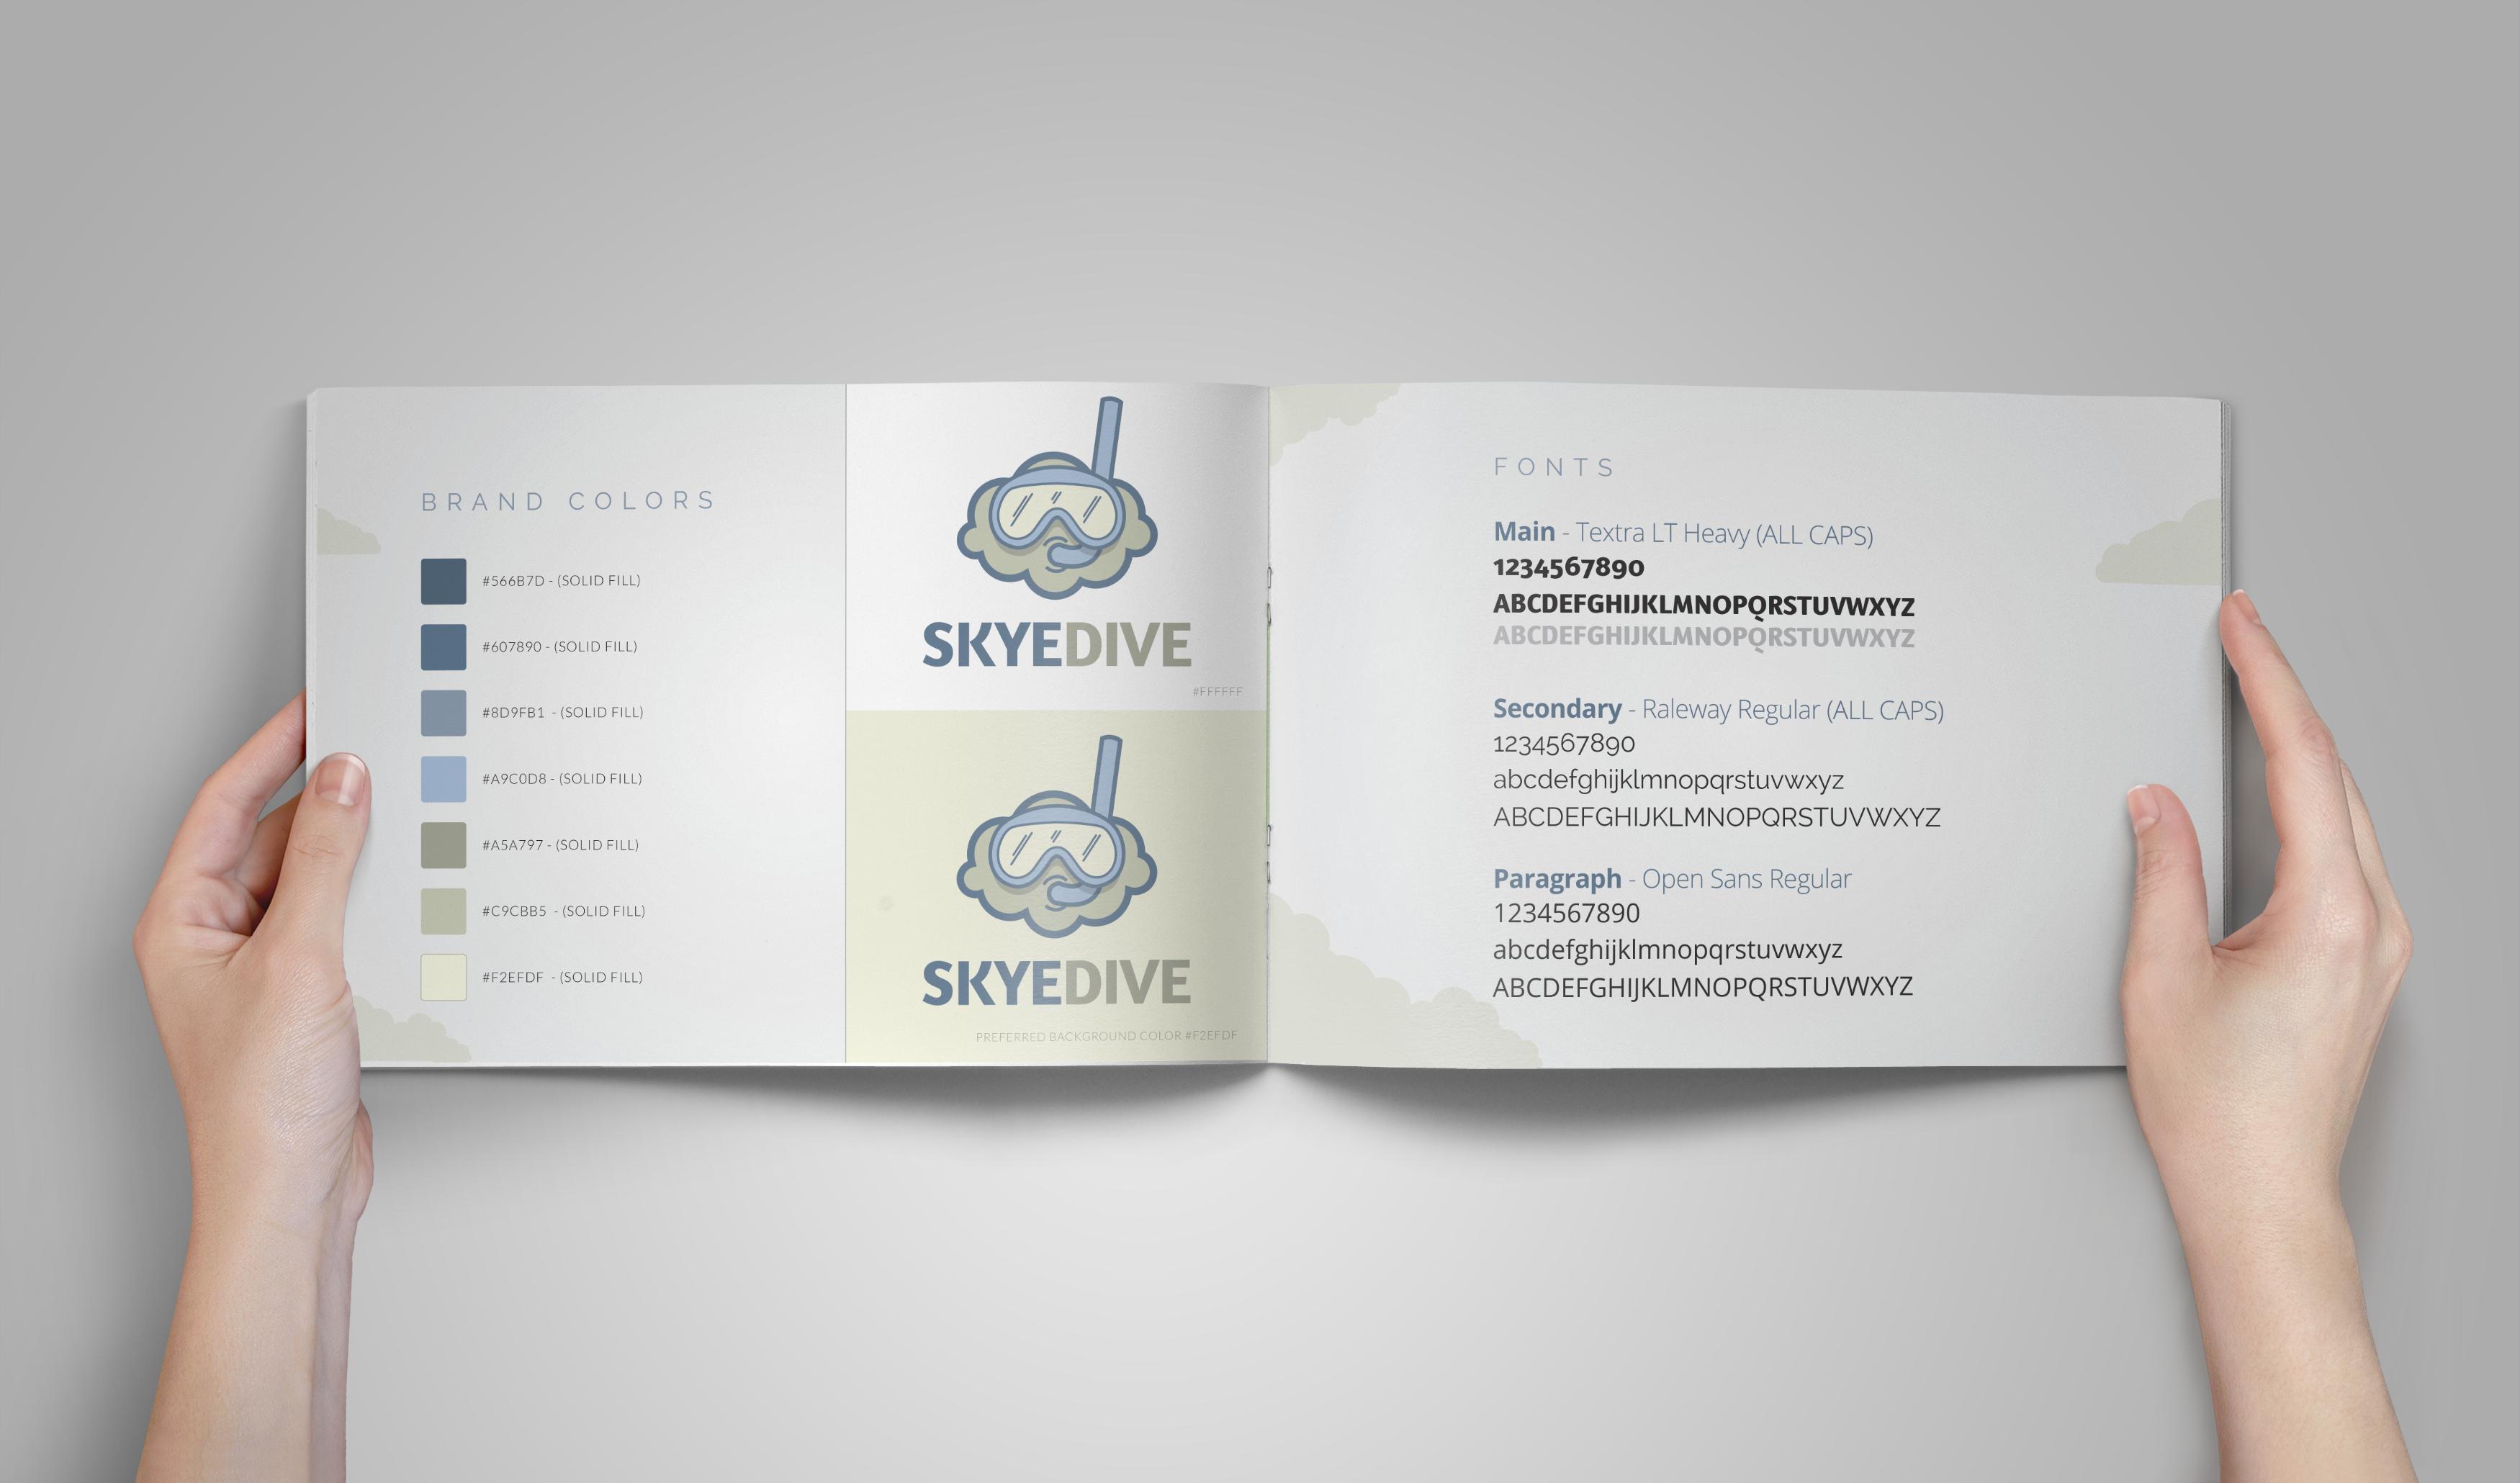 Skyedive_Brand_Guide_2